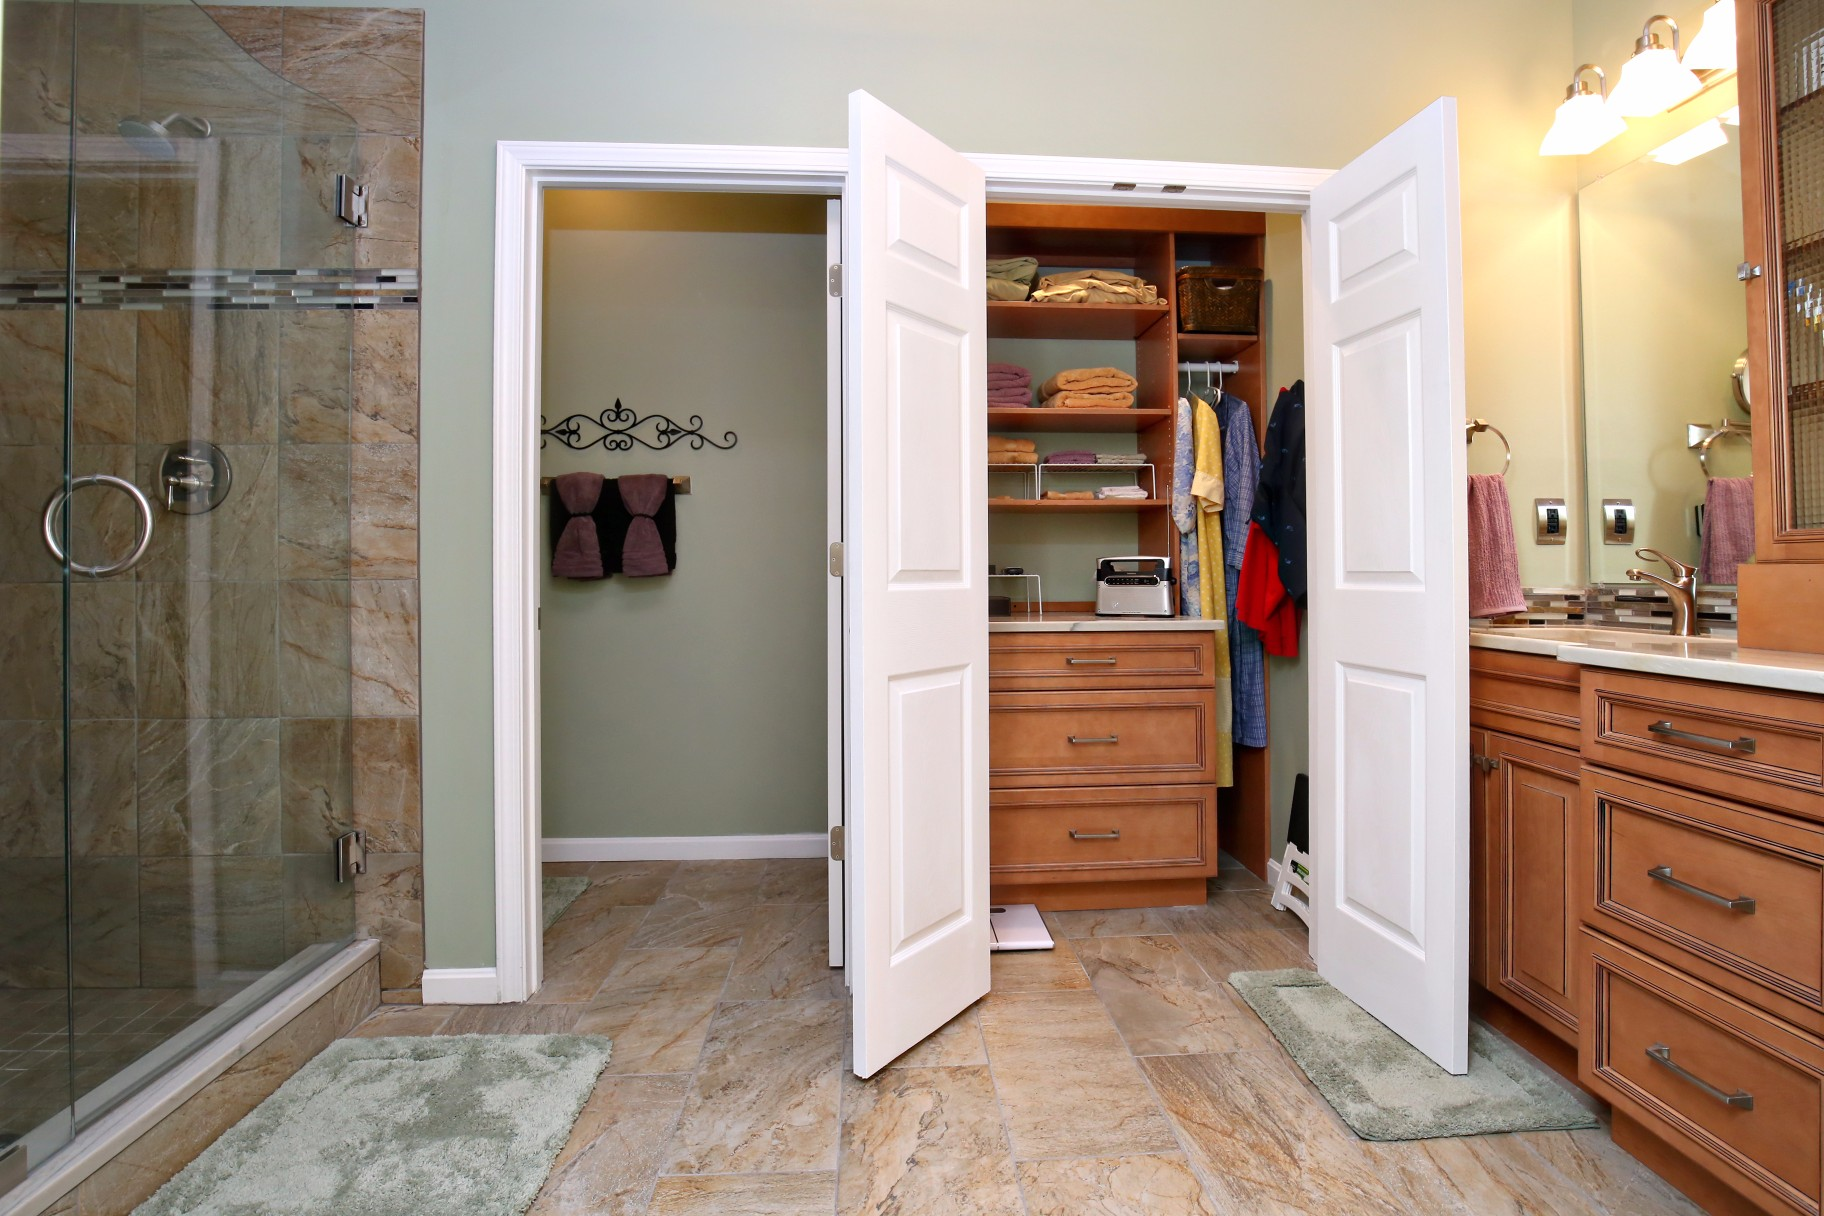 Savvy Home Supply Offers Kitchen Bath Remodeling Tips Kitchen Bath Remodeling In